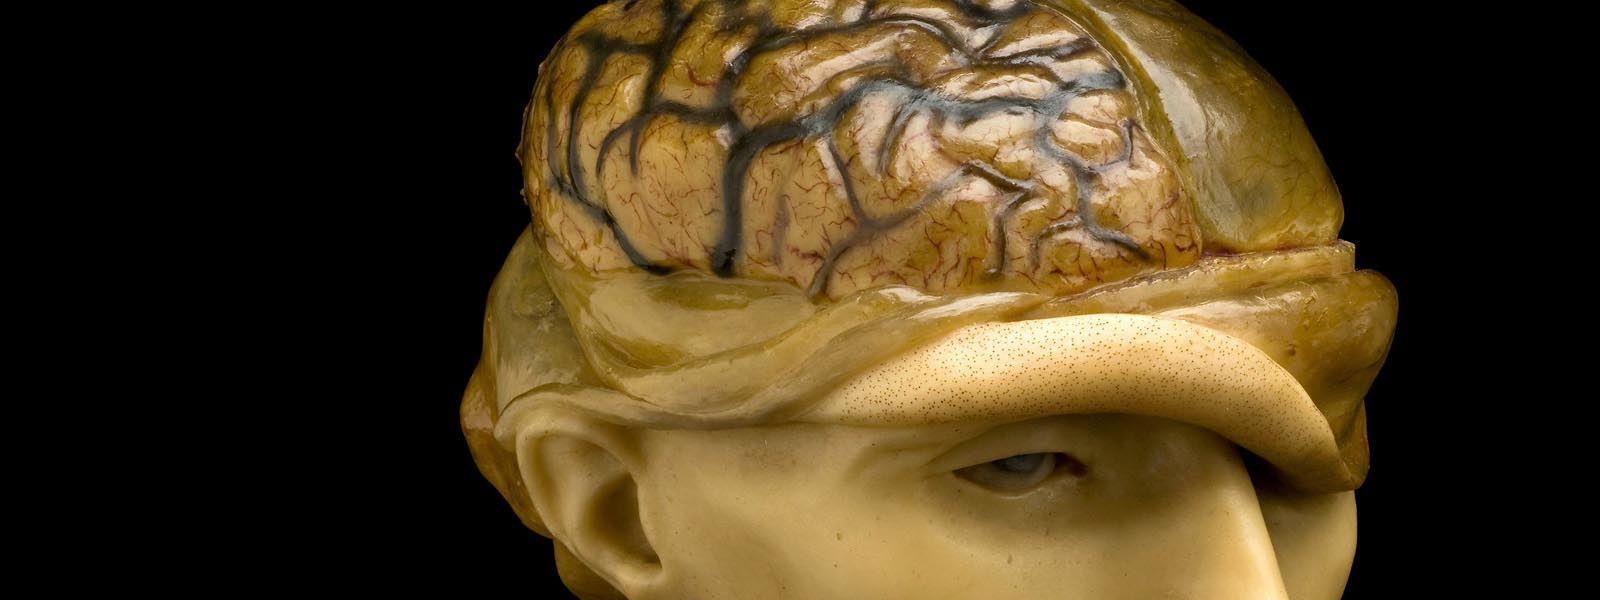 Niezwykłe perypetie mózgu Alberta Einsteina